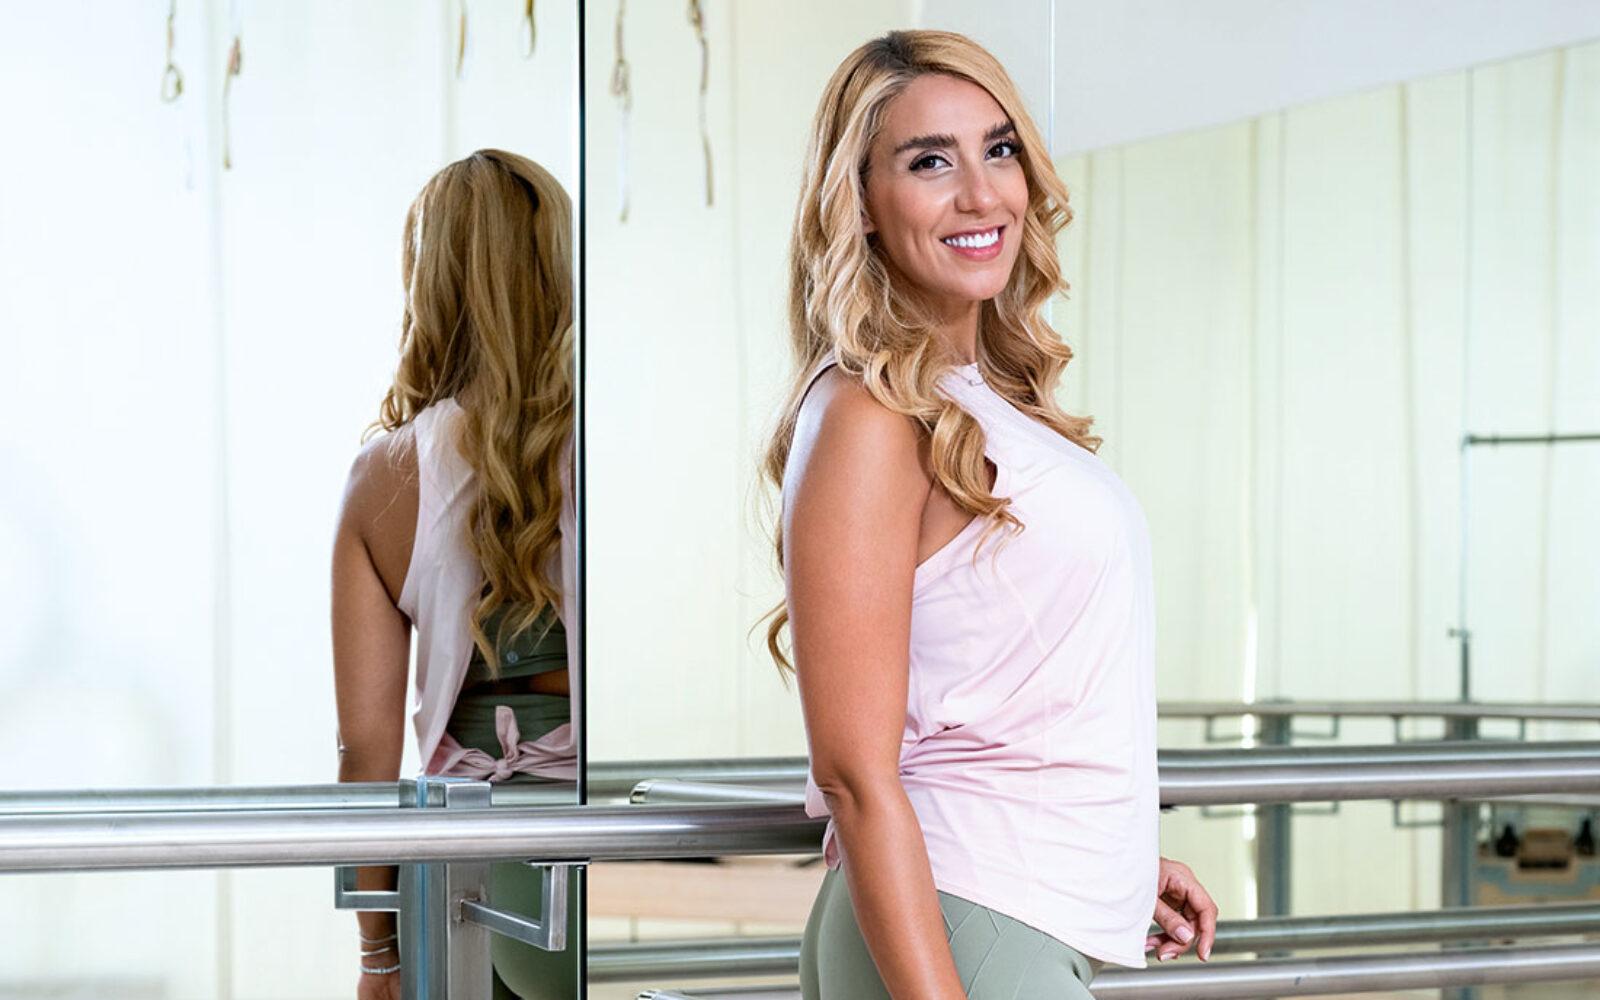 Goli Hashtroudi Cramer poses in front of a mirror in a fitness studio